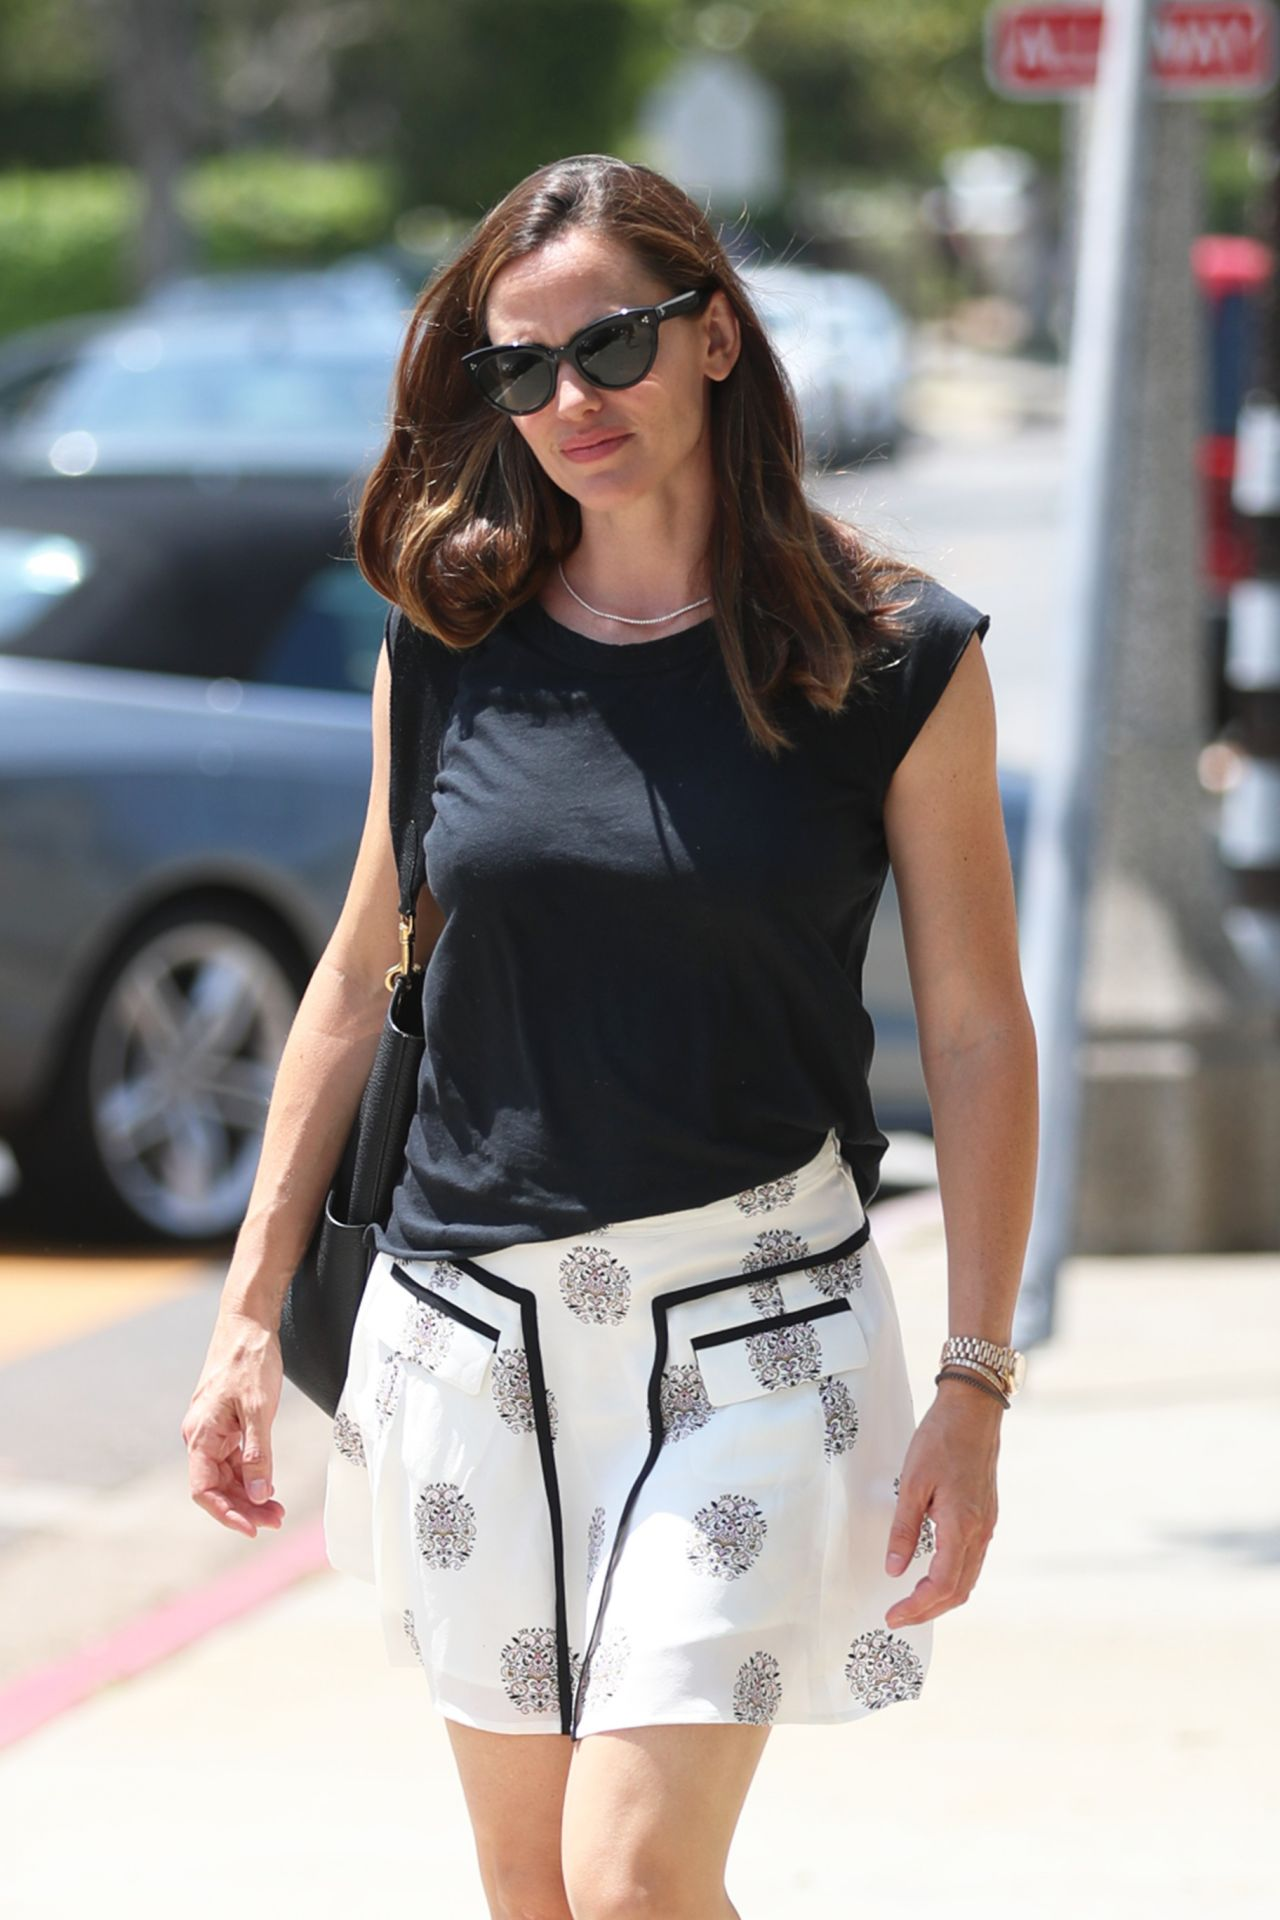 Jennifer Garner Leaving Church In Los Angeles 07 09 2017